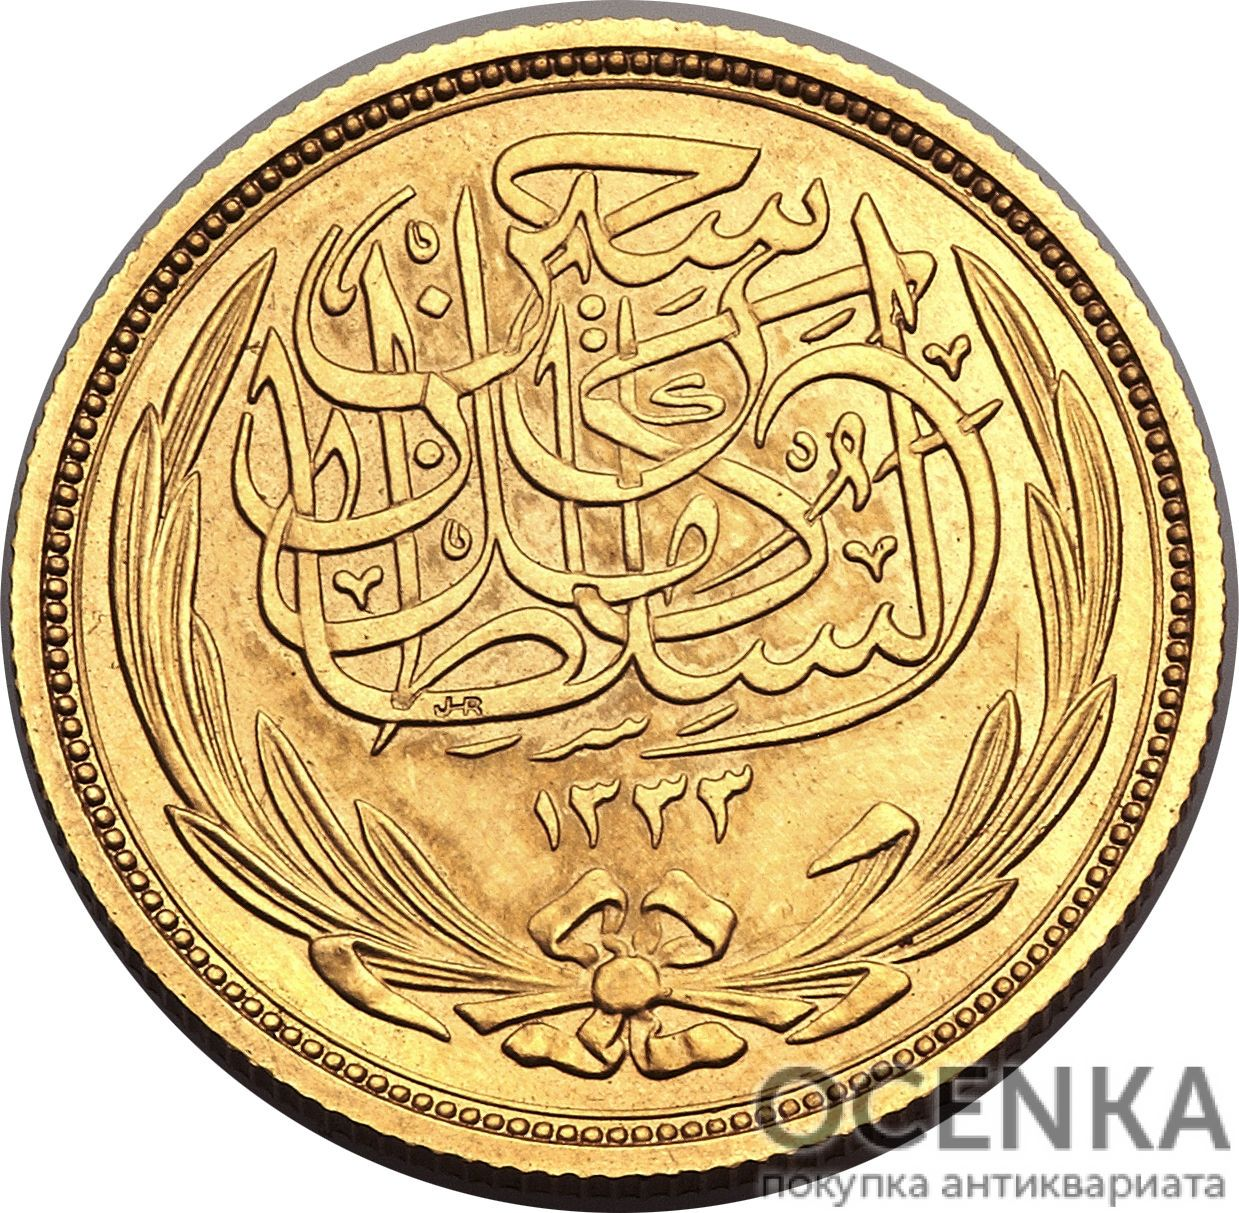 Золотая монета 100 Пиастров, Кирш (100 Piastres, Qirsh) Египет - 1